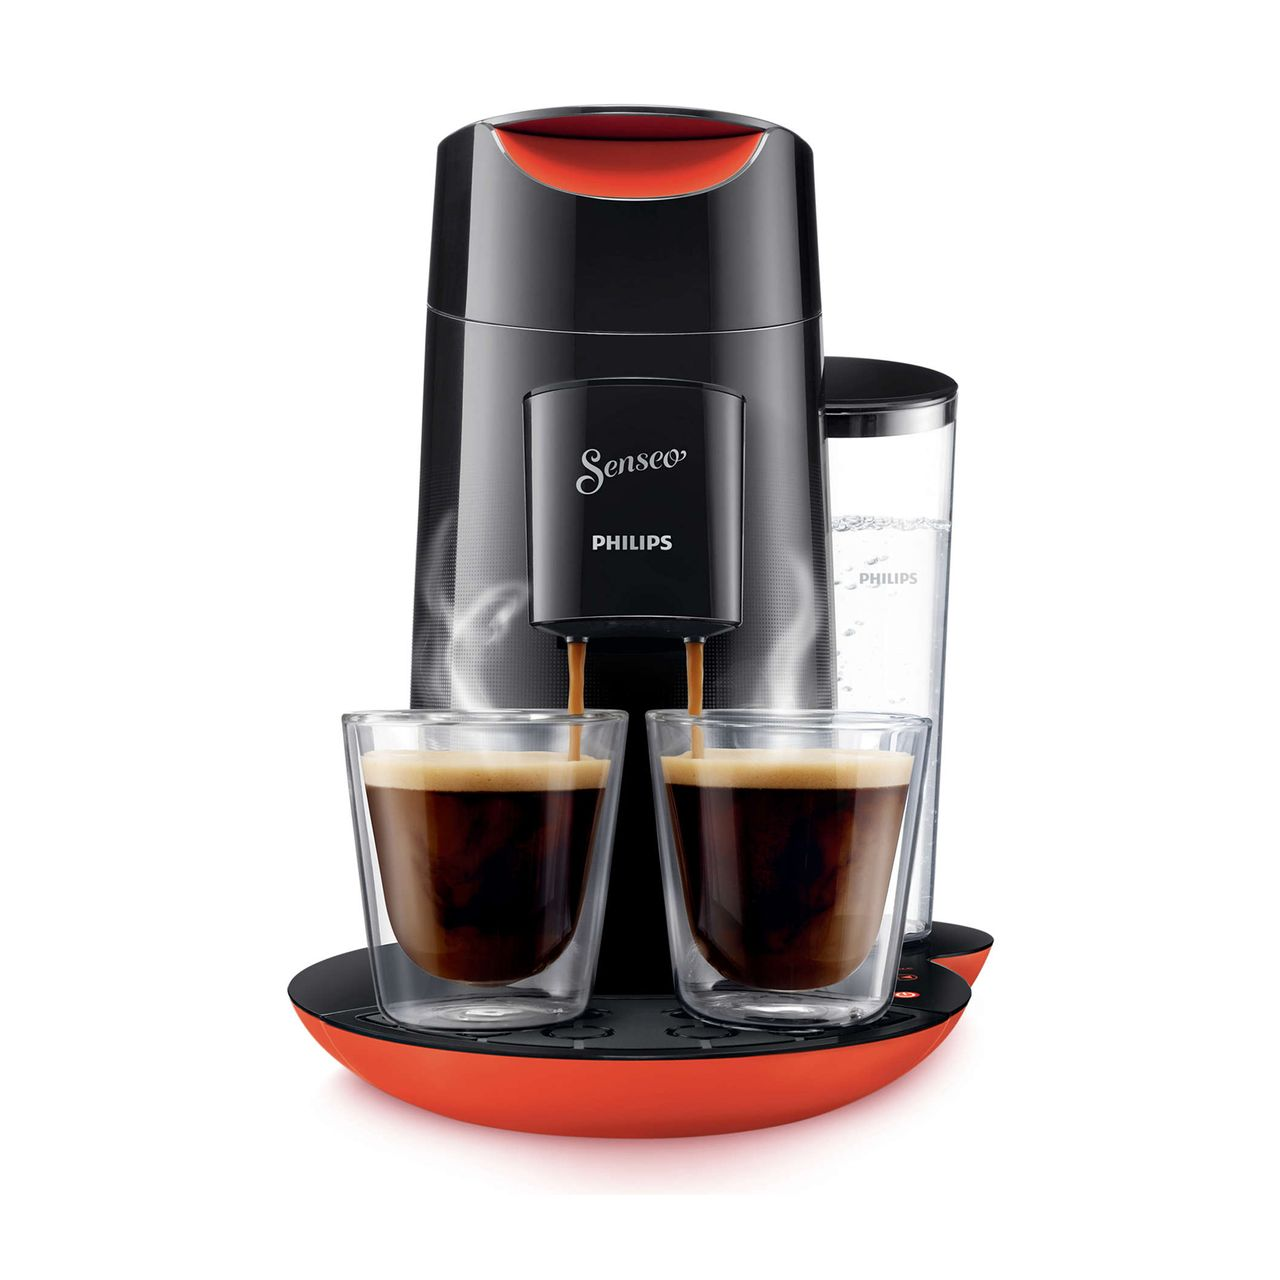 philips hd7870 31 maschine kaffeepadmaschine senseo twist schwarz rot ebay. Black Bedroom Furniture Sets. Home Design Ideas